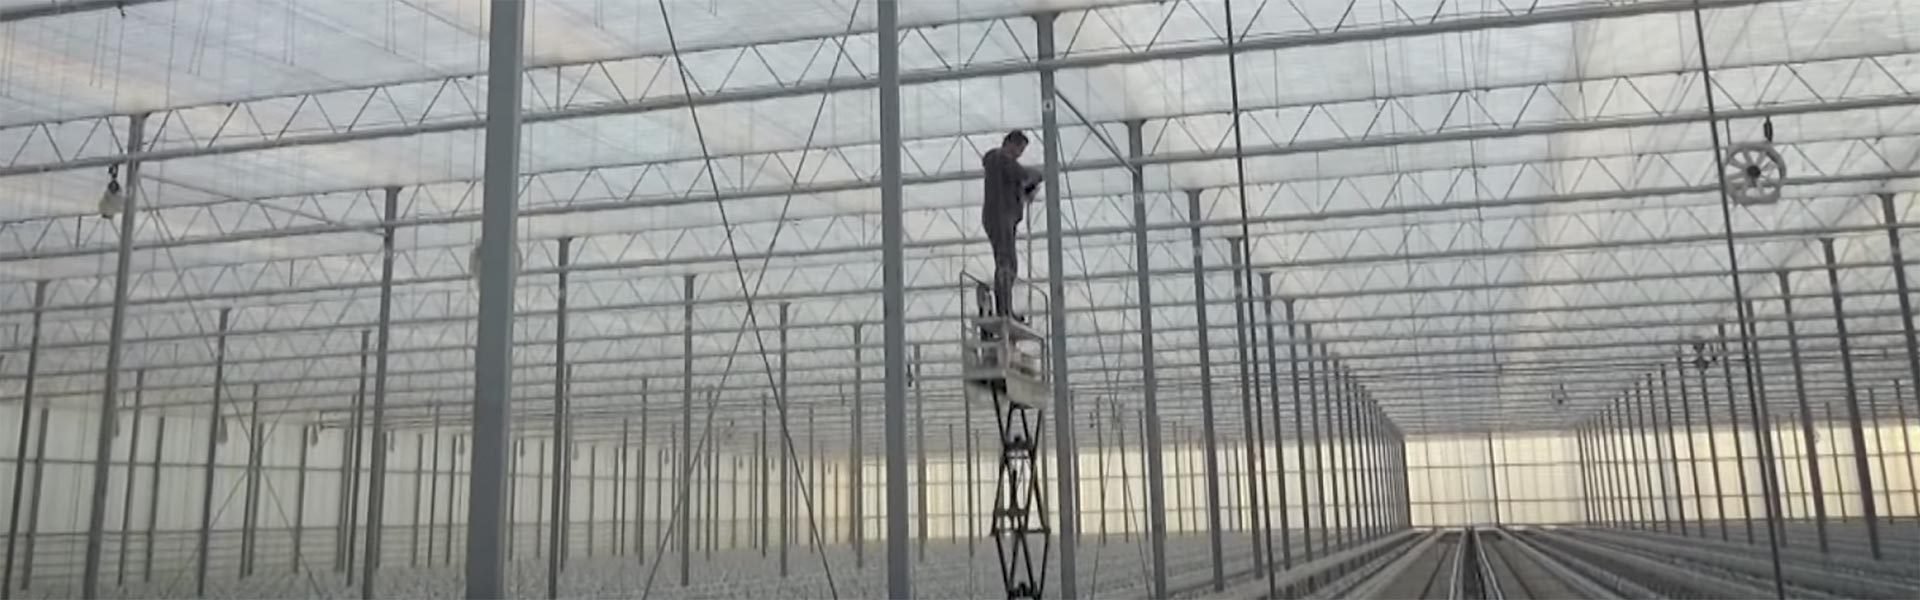 Oplossing touwhangen kas